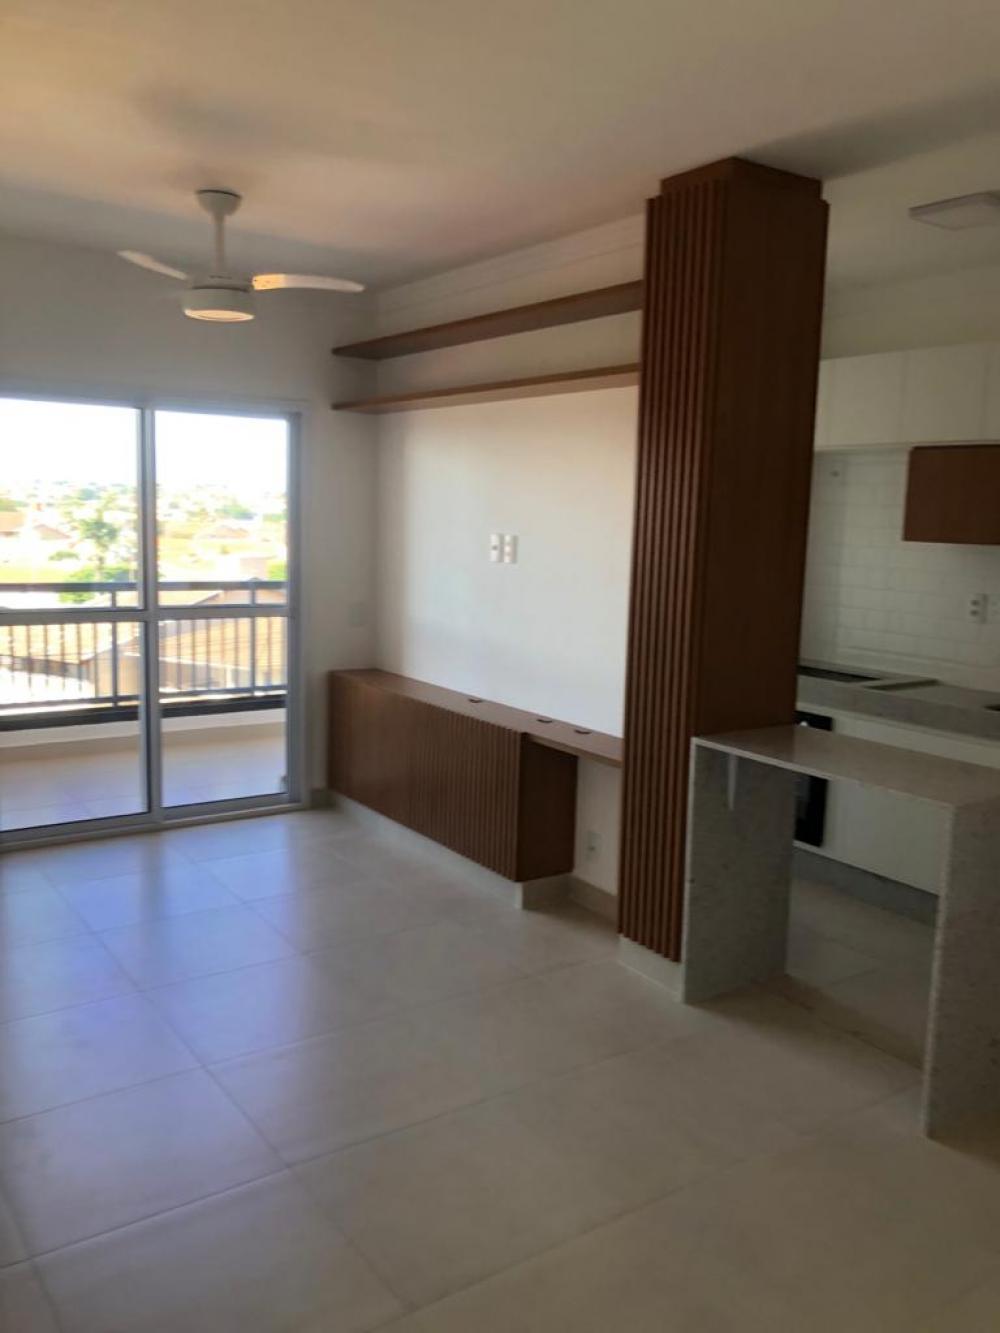 SAO JOSE DO RIO PRETO Apartamento Locacao R$ 1.800,00 Condominio R$390,00 3 Dormitorios 2 Vagas Area construida 77.00m2